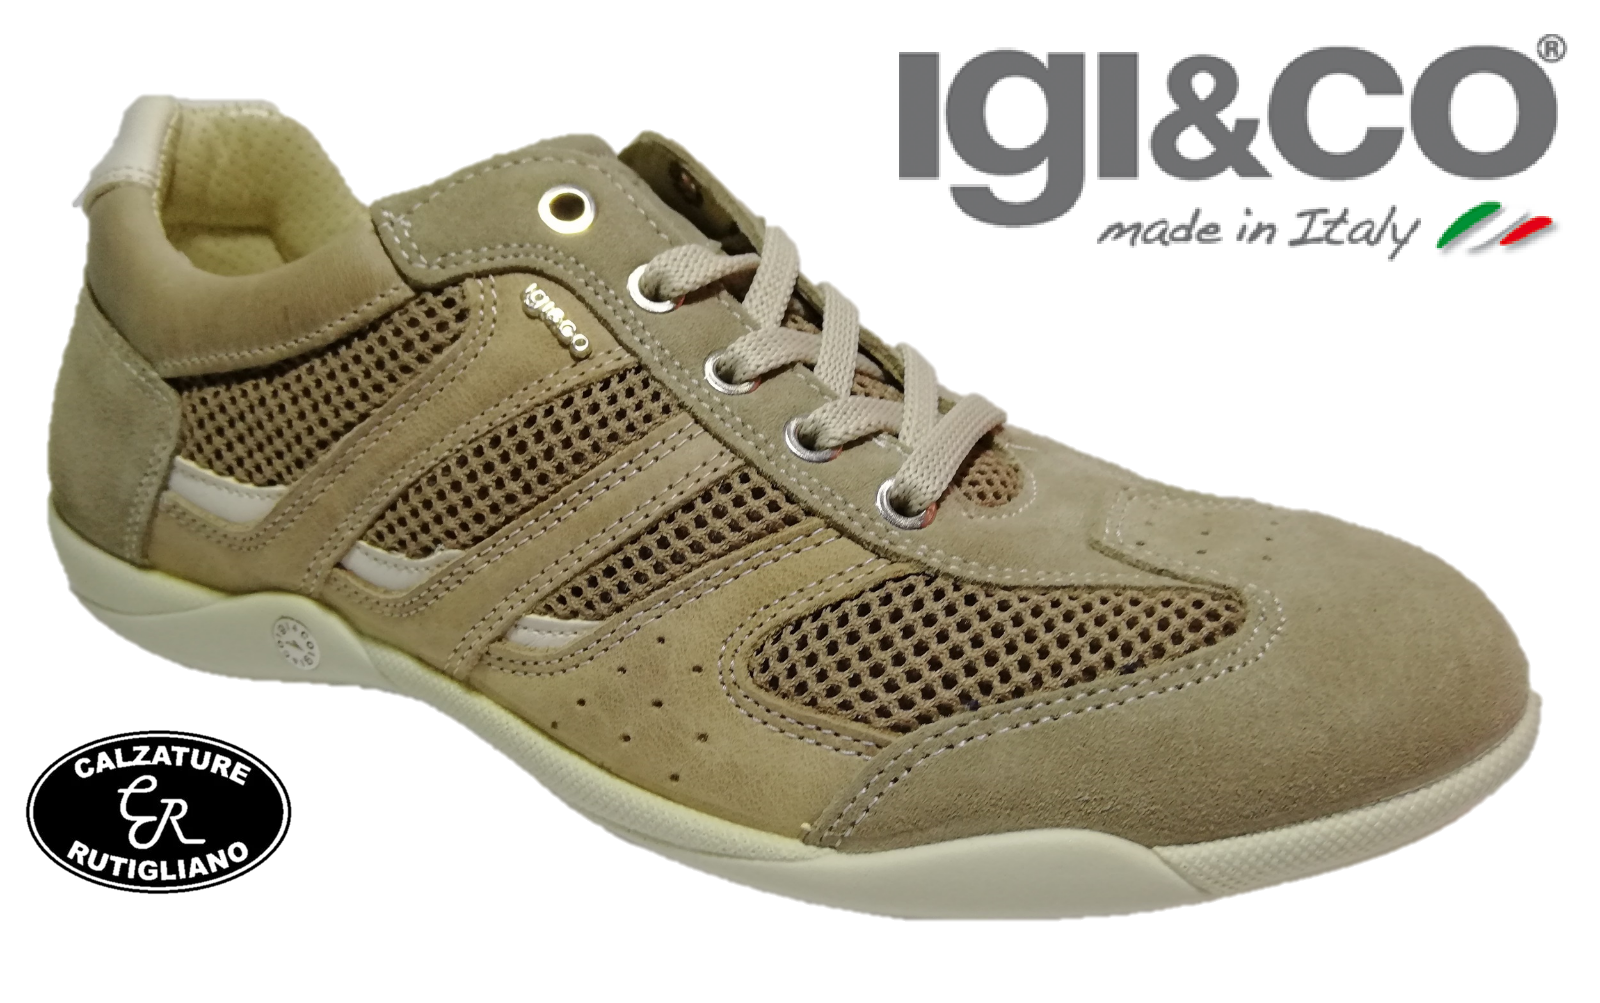 IGI&CO chaussures hommes baskets SCAMOSCIATO RETE BEIGE PLANTARE ESTRAIBILE - 37312